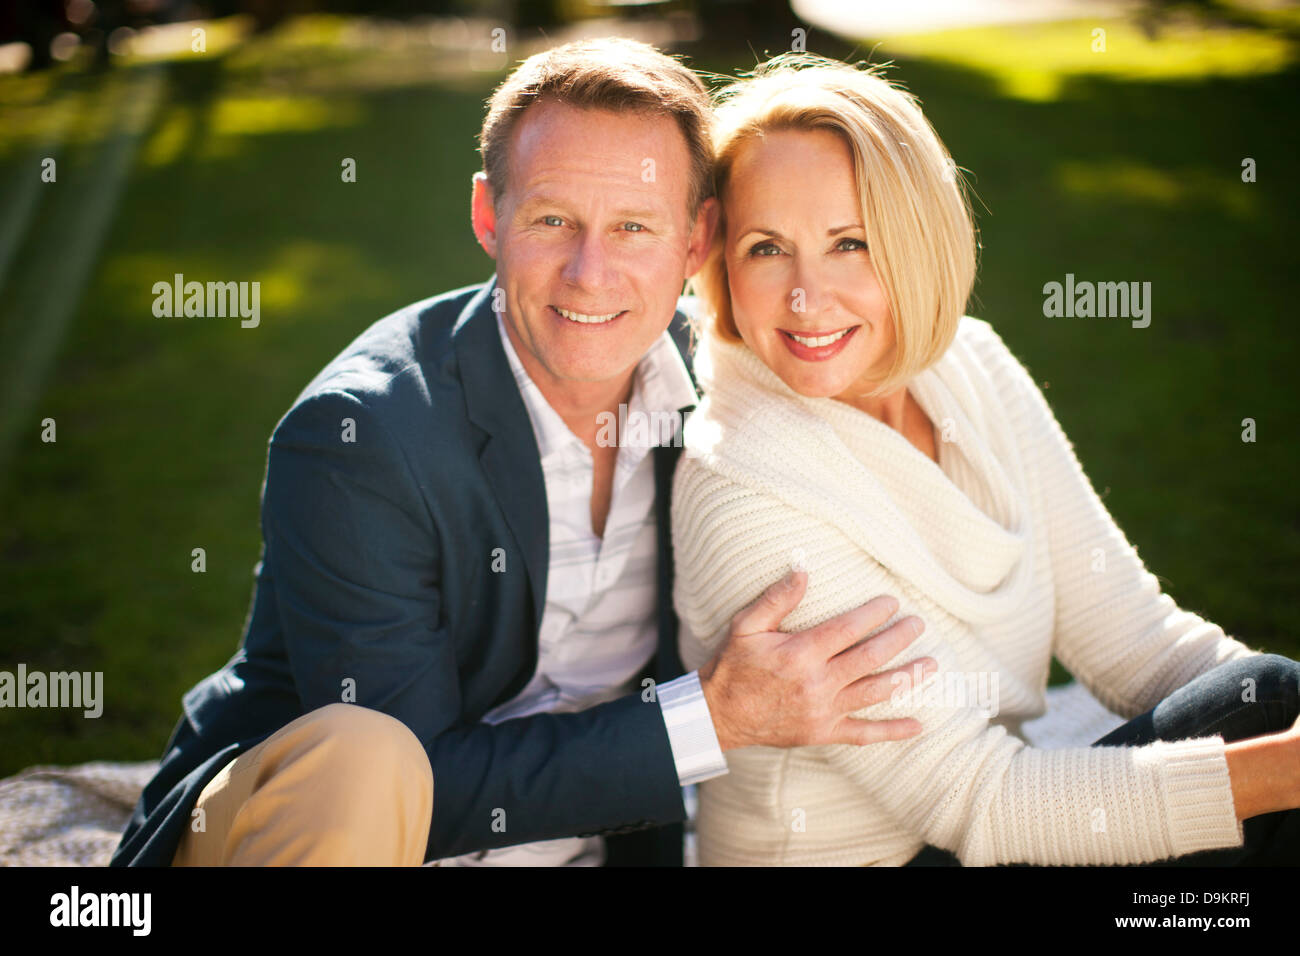 Loving heterosexual couple in park - Stock Image